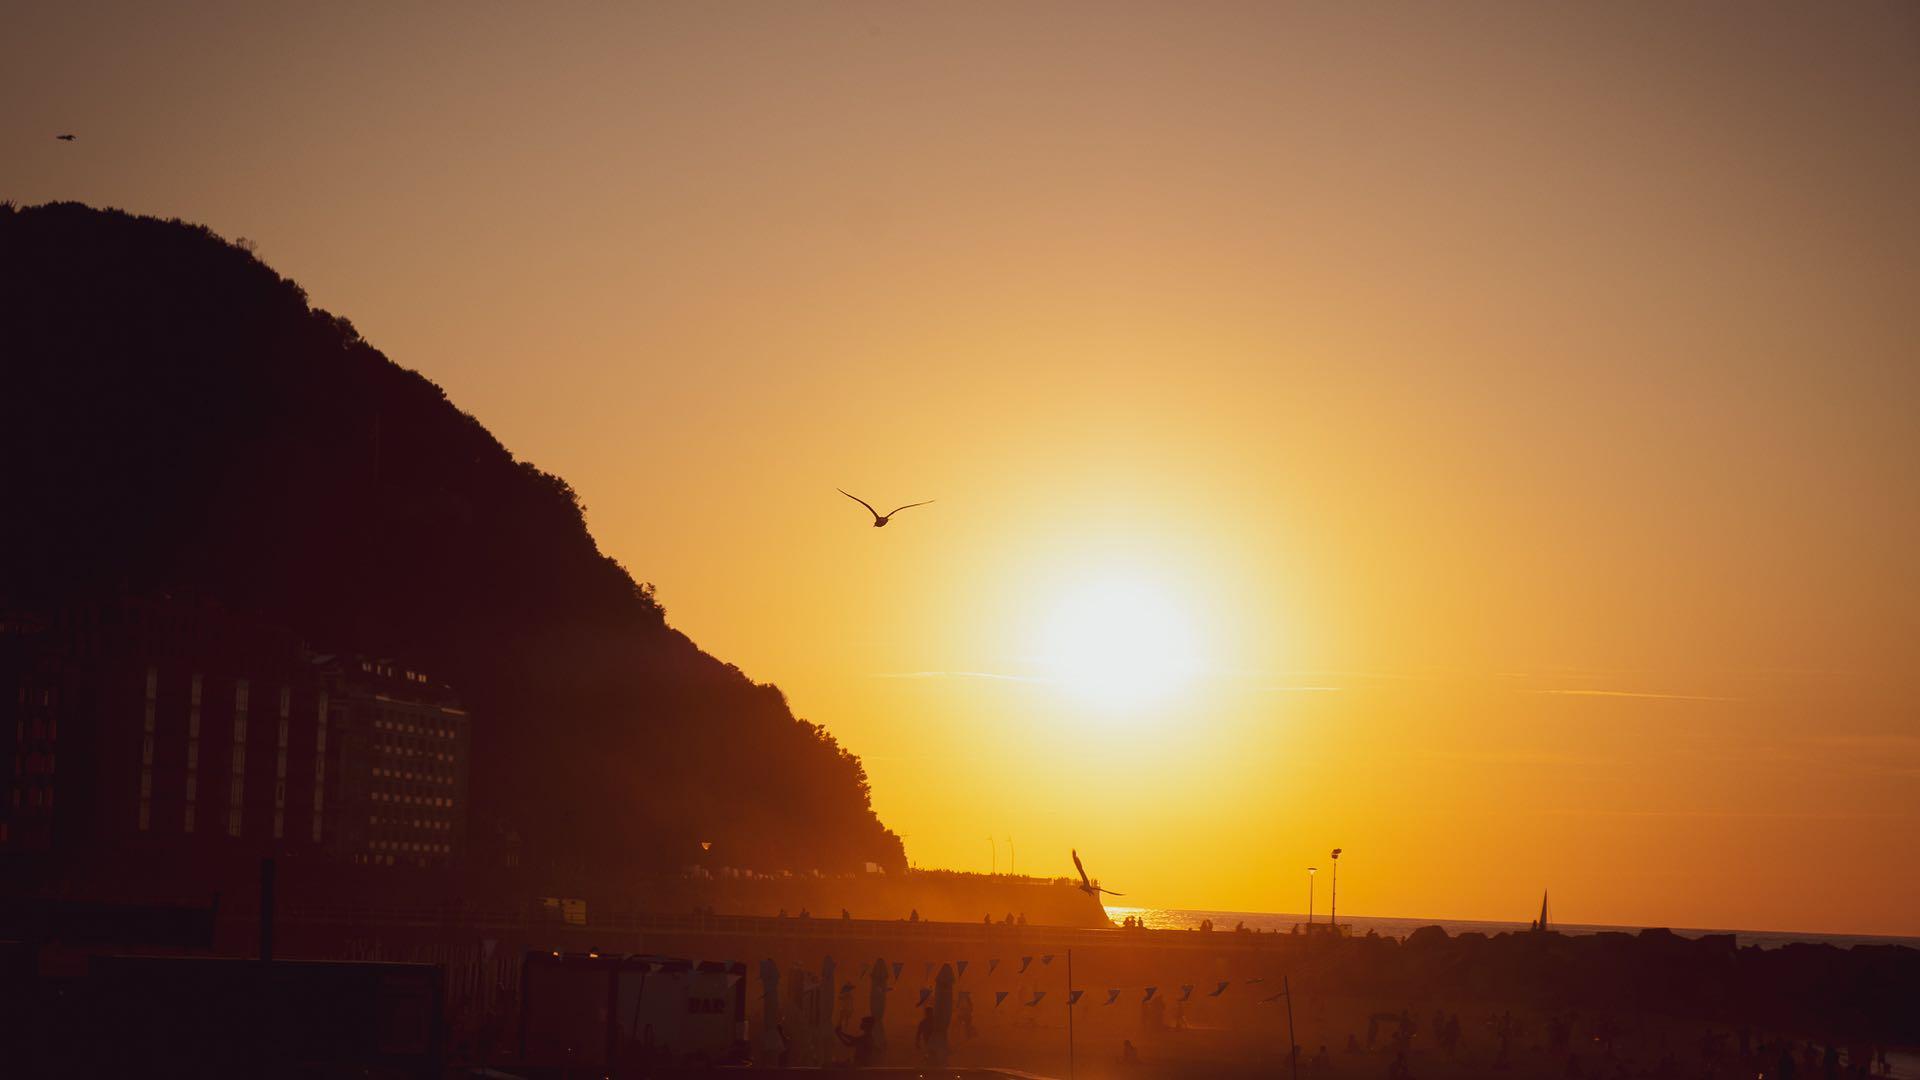 Sunset San Sebastian 1920×1080